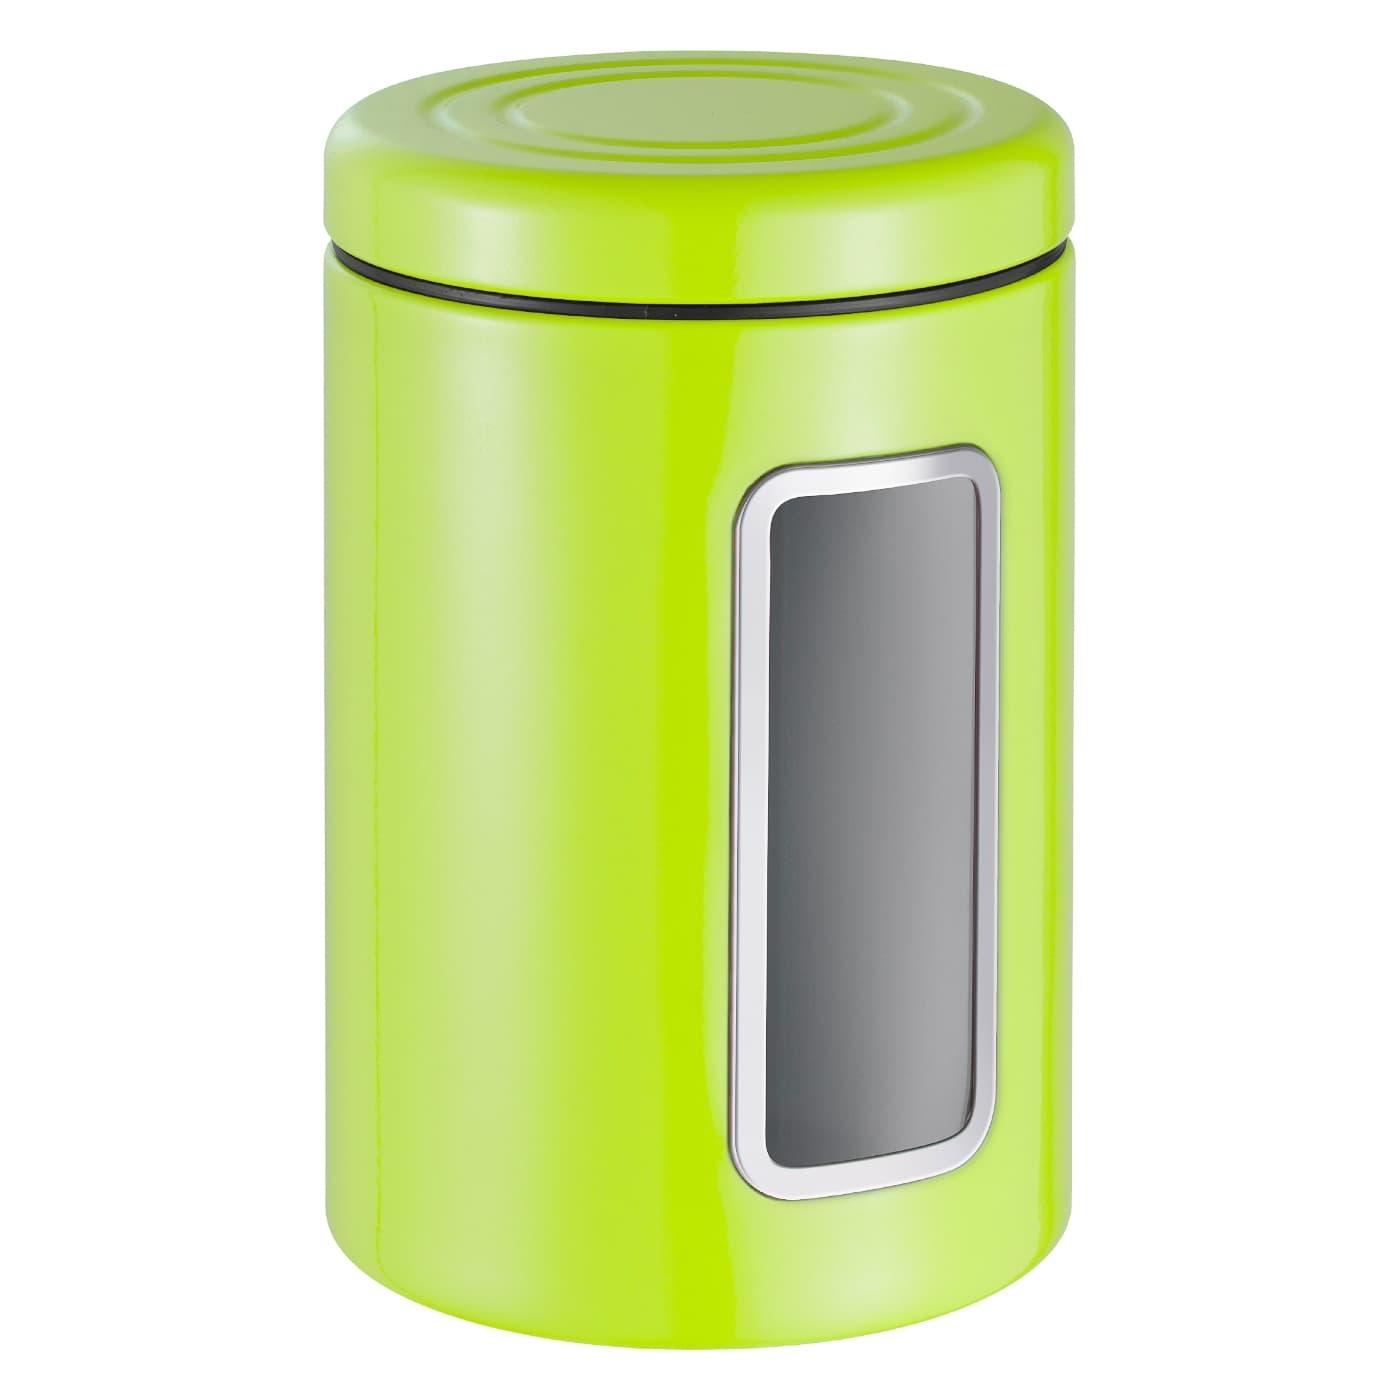 Recipient pentru depozitare cu capac, din metal si plastic, Classic Line Lime, 2L, Ø12,5xH18,9 cm